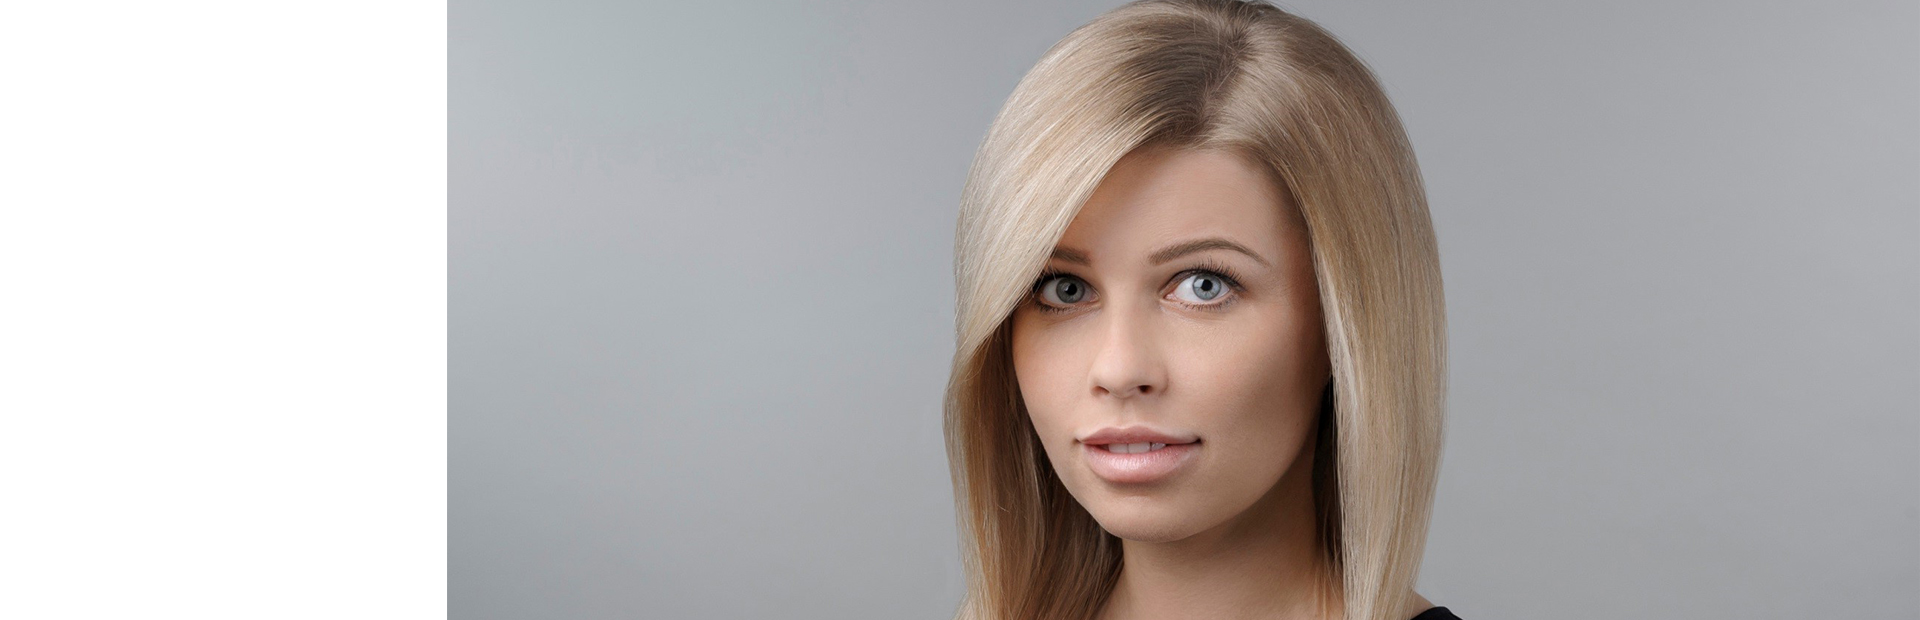 Буст ап (прикорневой объём волос)